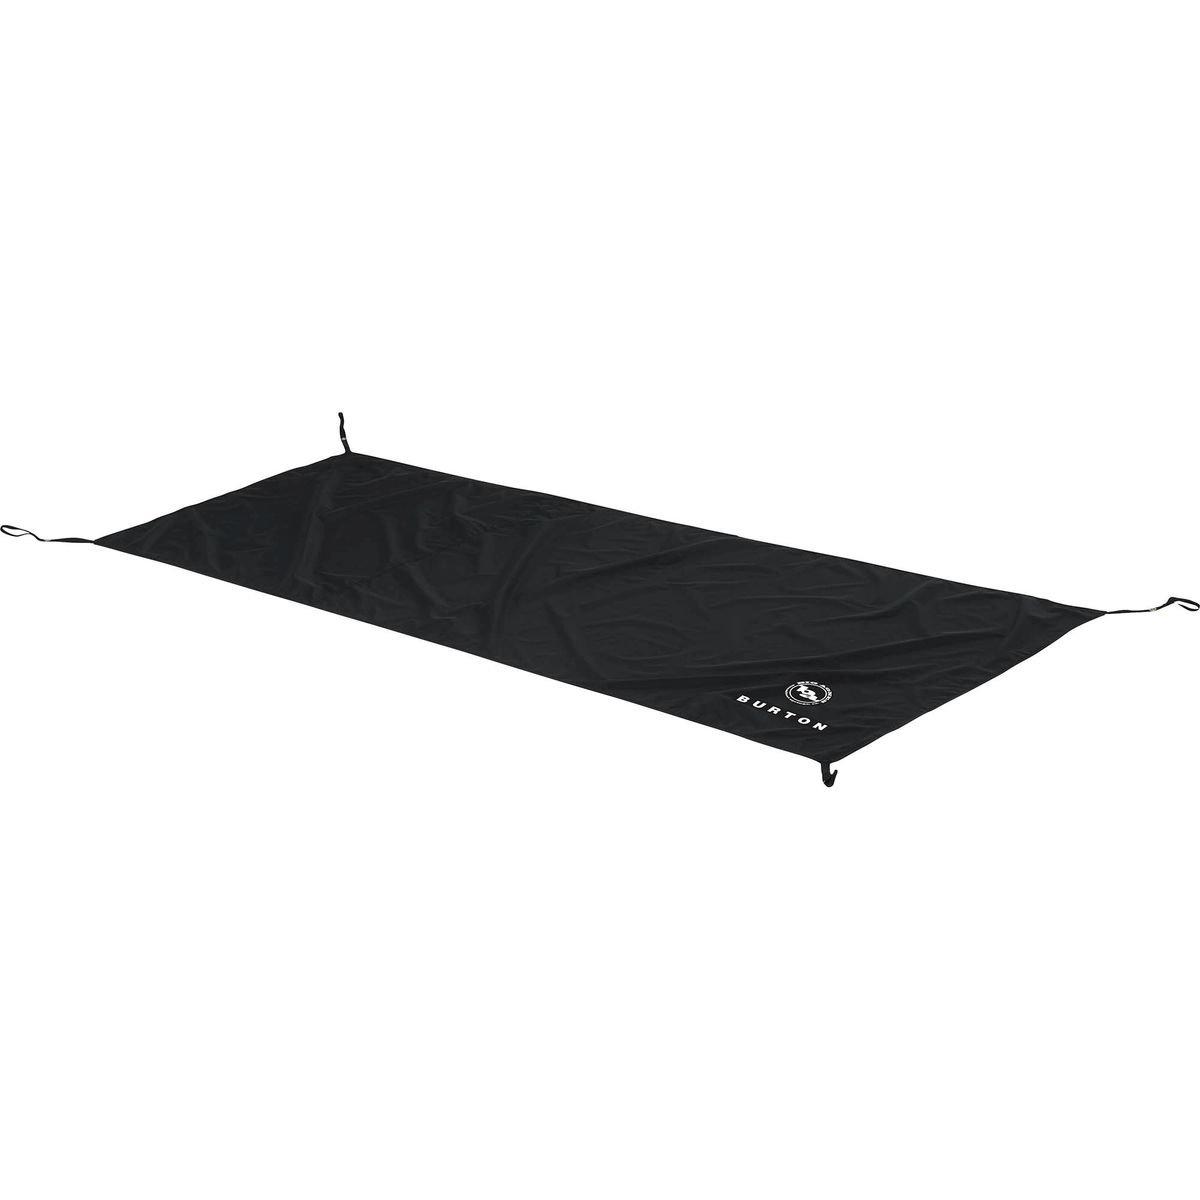 Burton Blacktail 2 Tent Footprint, True Black by Burton